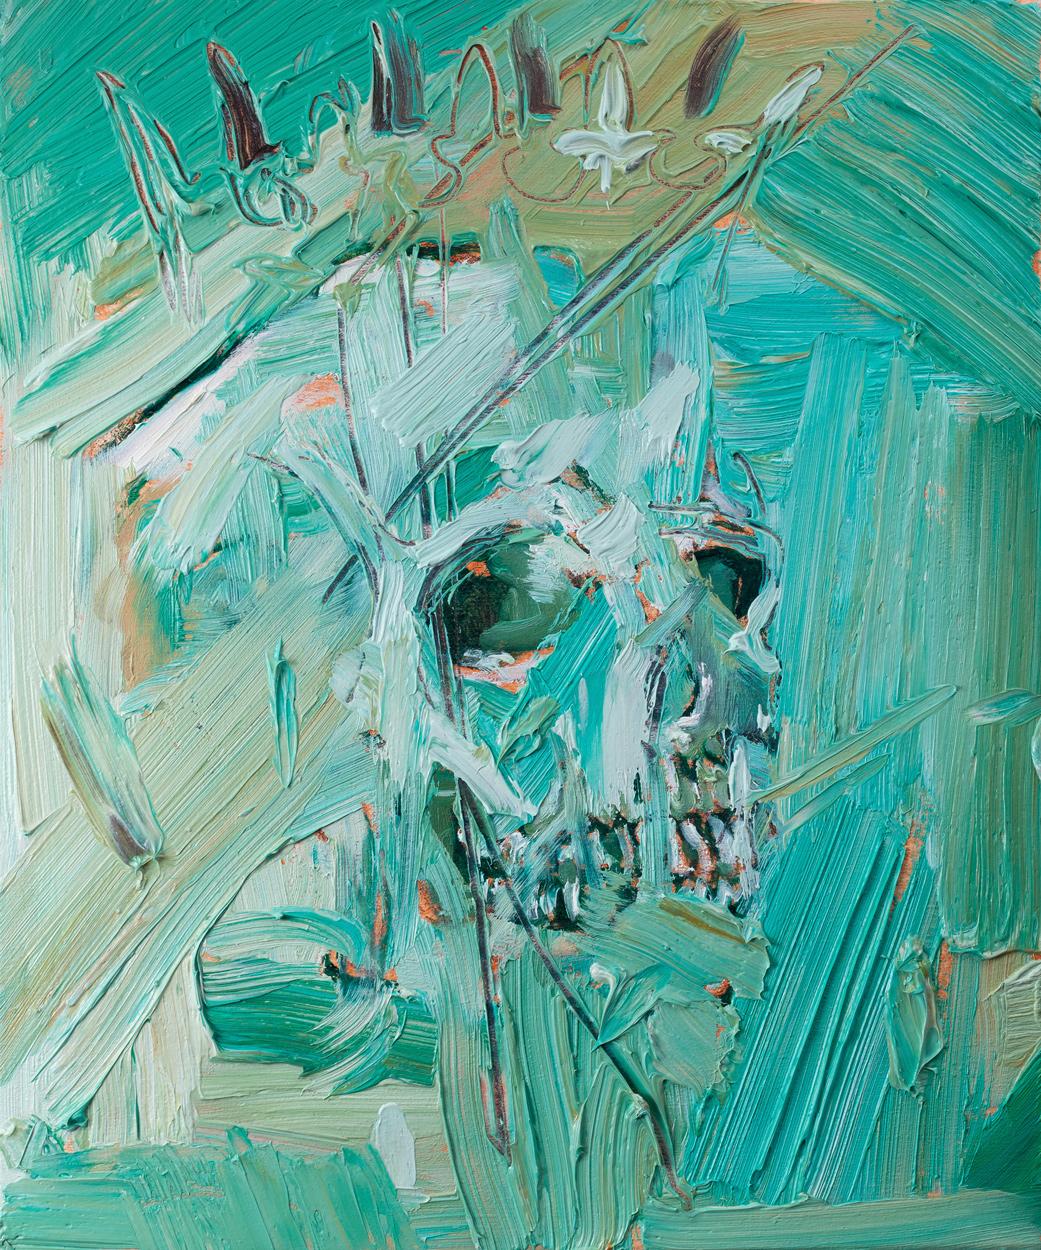 Skullitsky, oil and pencil on canvas, 30x20 cm, 2013